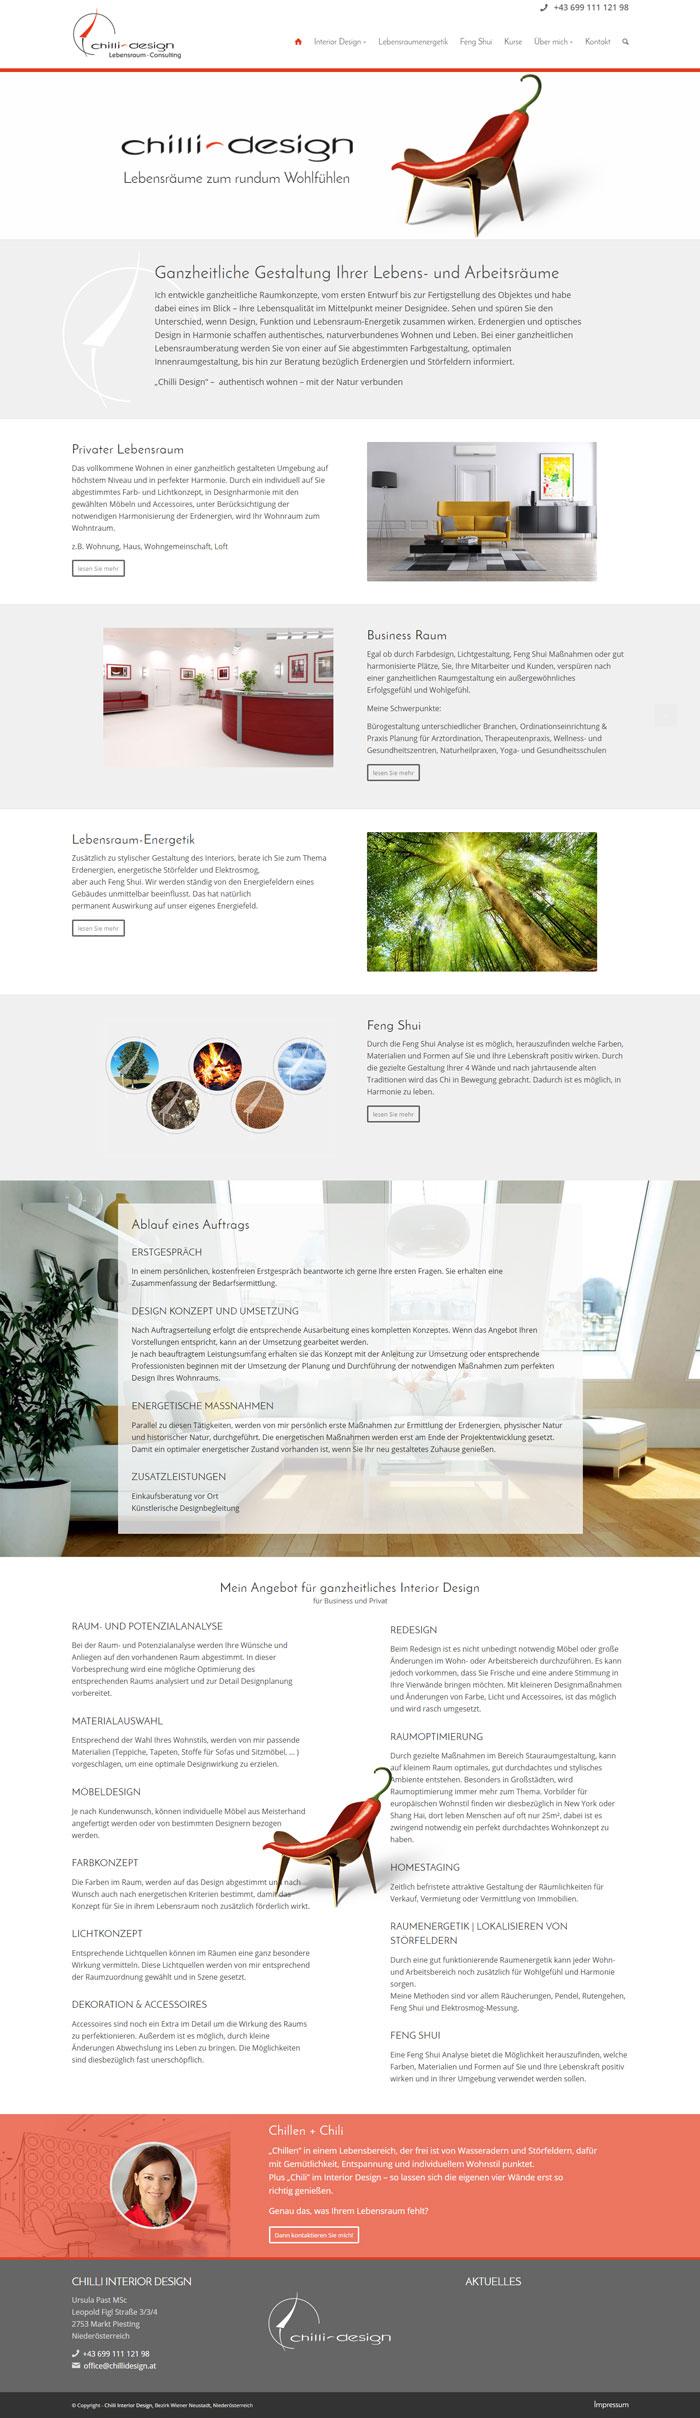 Webdesign Chilli